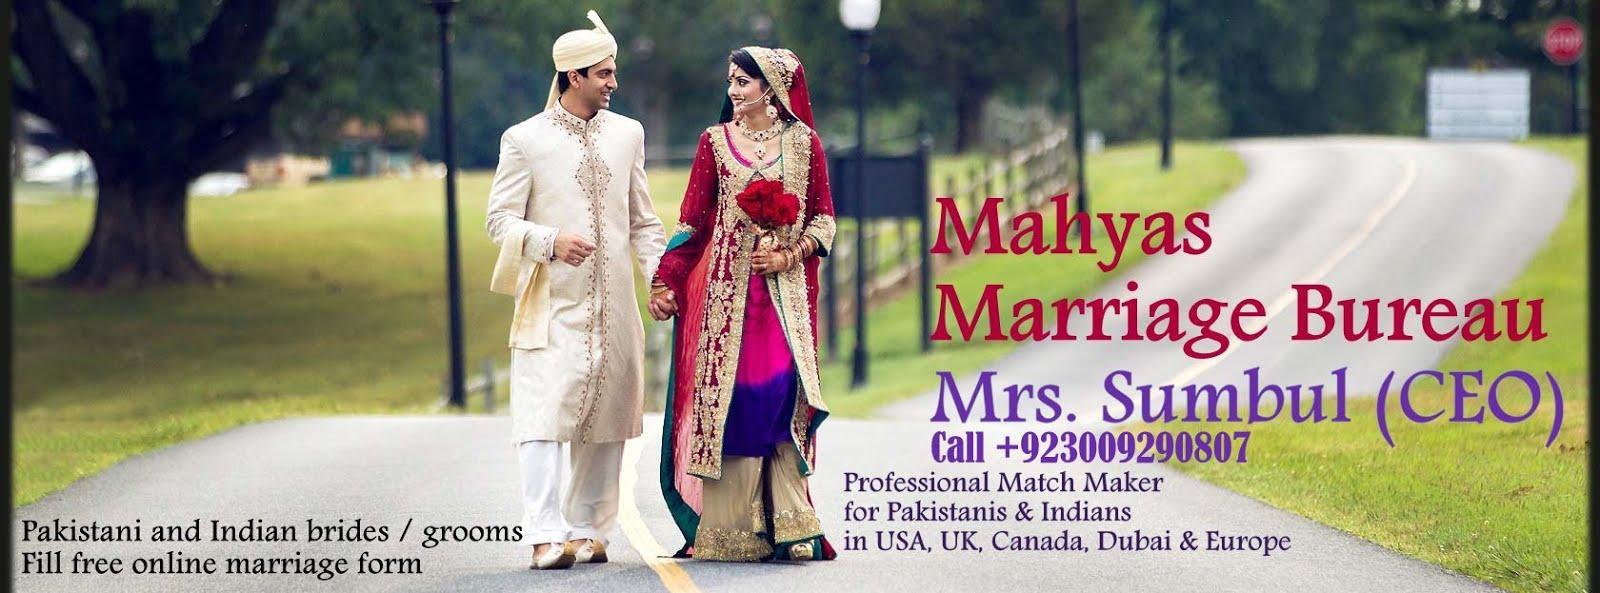 PAKISTANI MATRIMONIAL, RISHTAY, SHAADI, ONLINE, MATCHMAKING